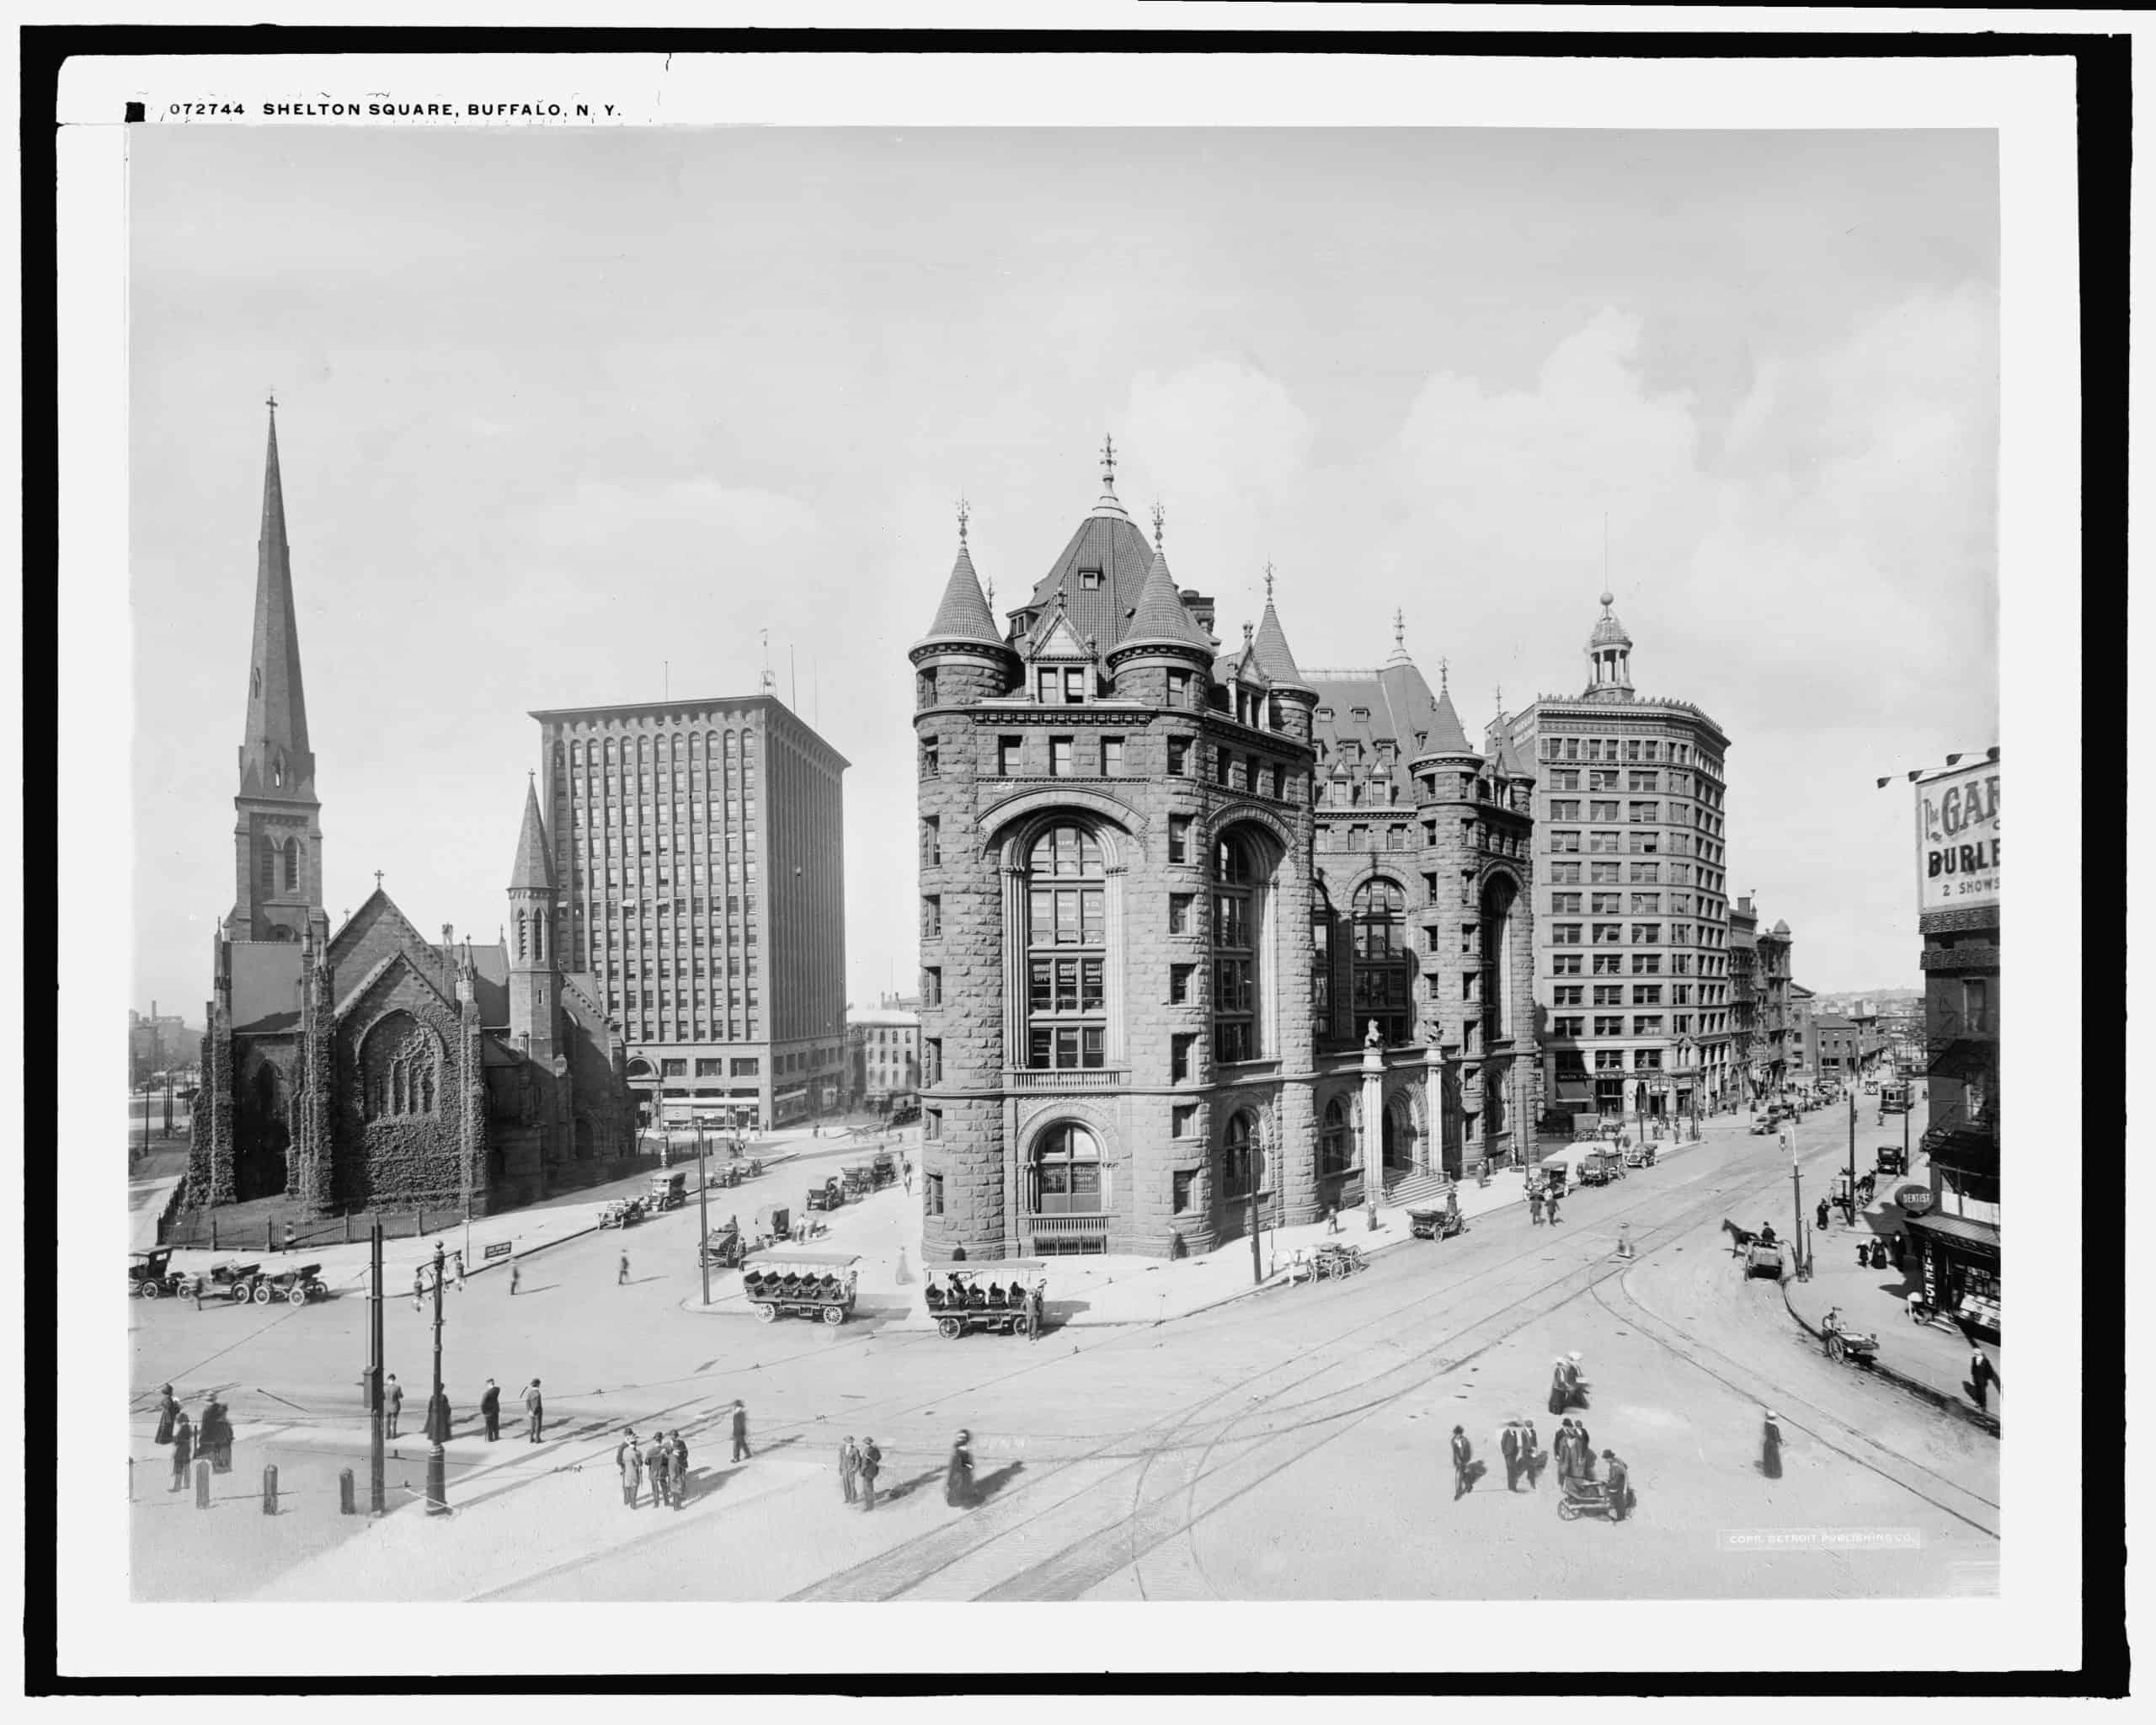 Shelton Square, Buffalo, N.Y., Detroit Publishing Co., between 1900 and 1920